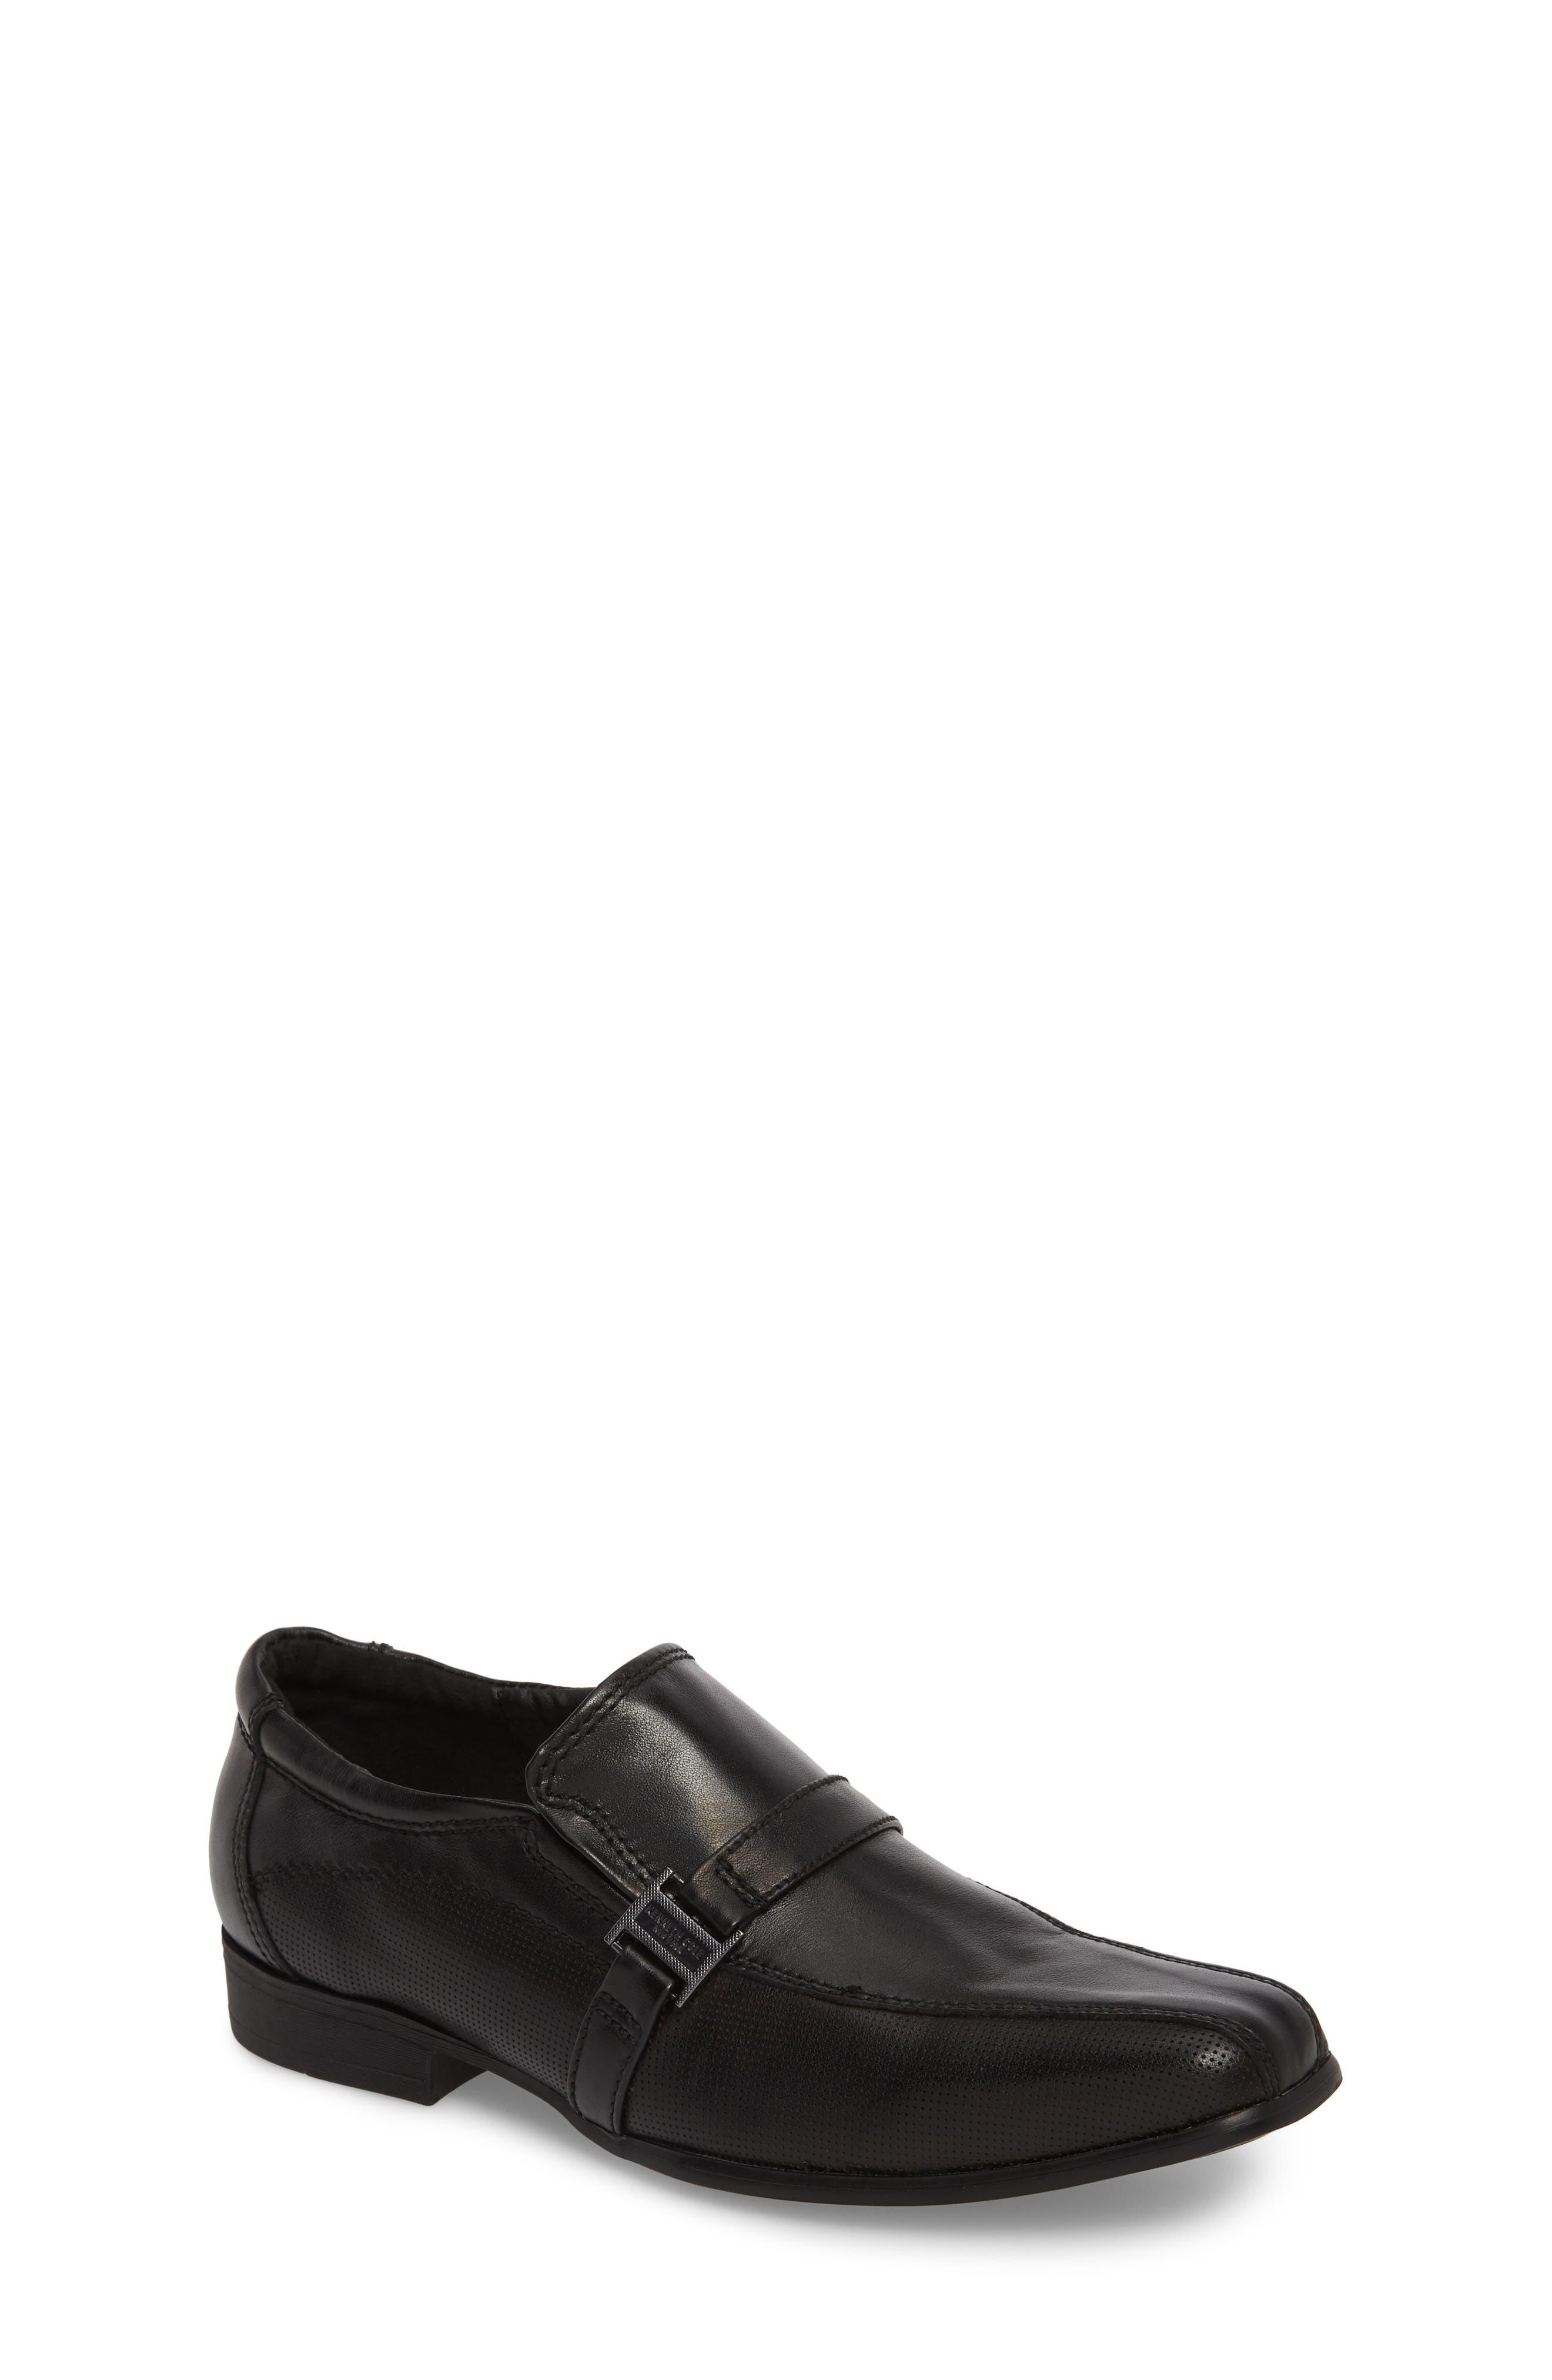 Magic News Venetian Loafer,                         Main,                         color, Black